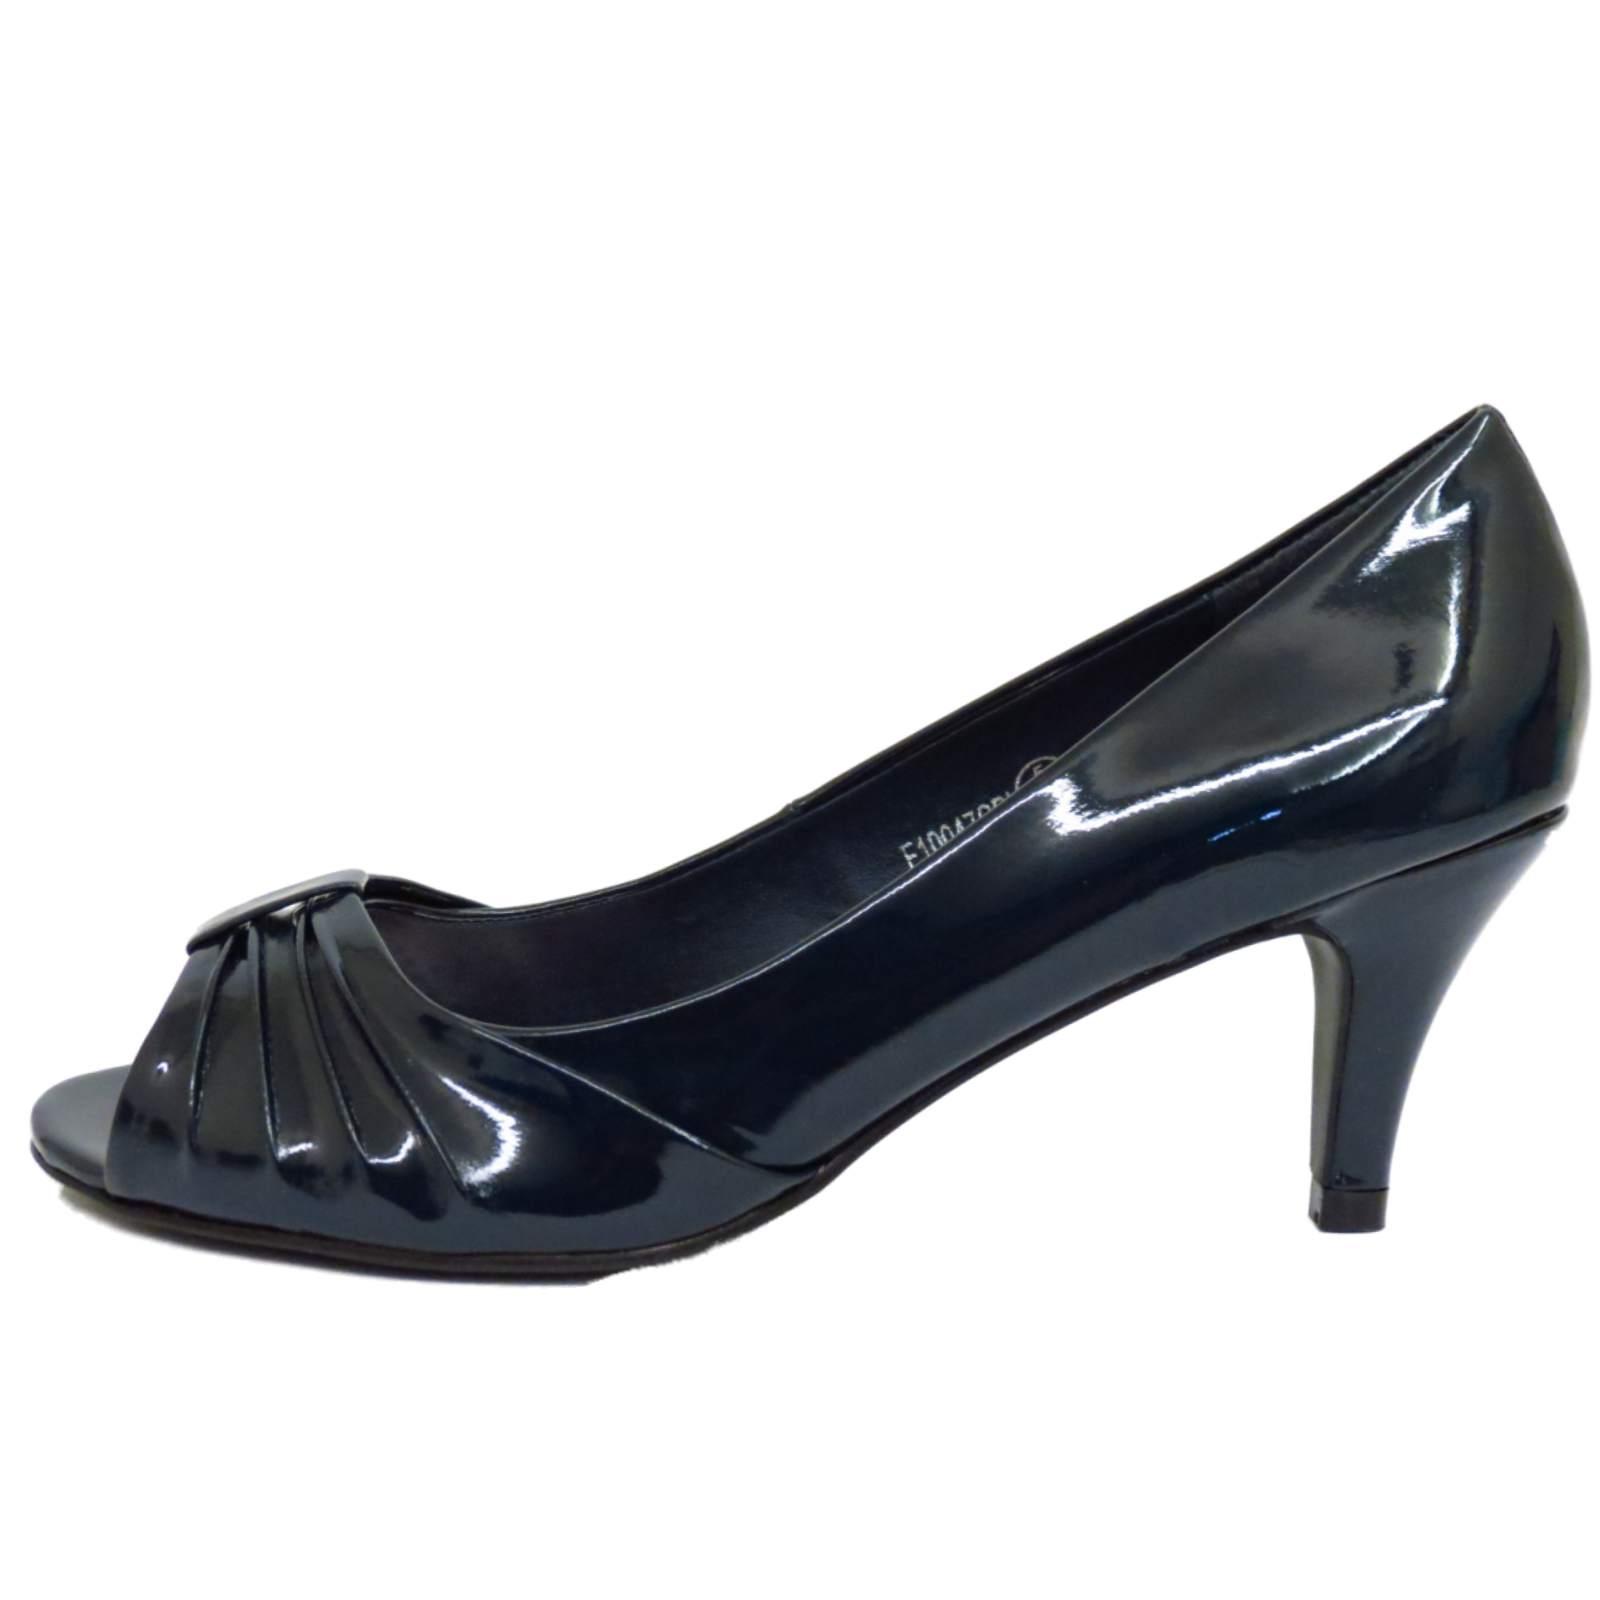 Brown Slip On Court Shoes Ladies